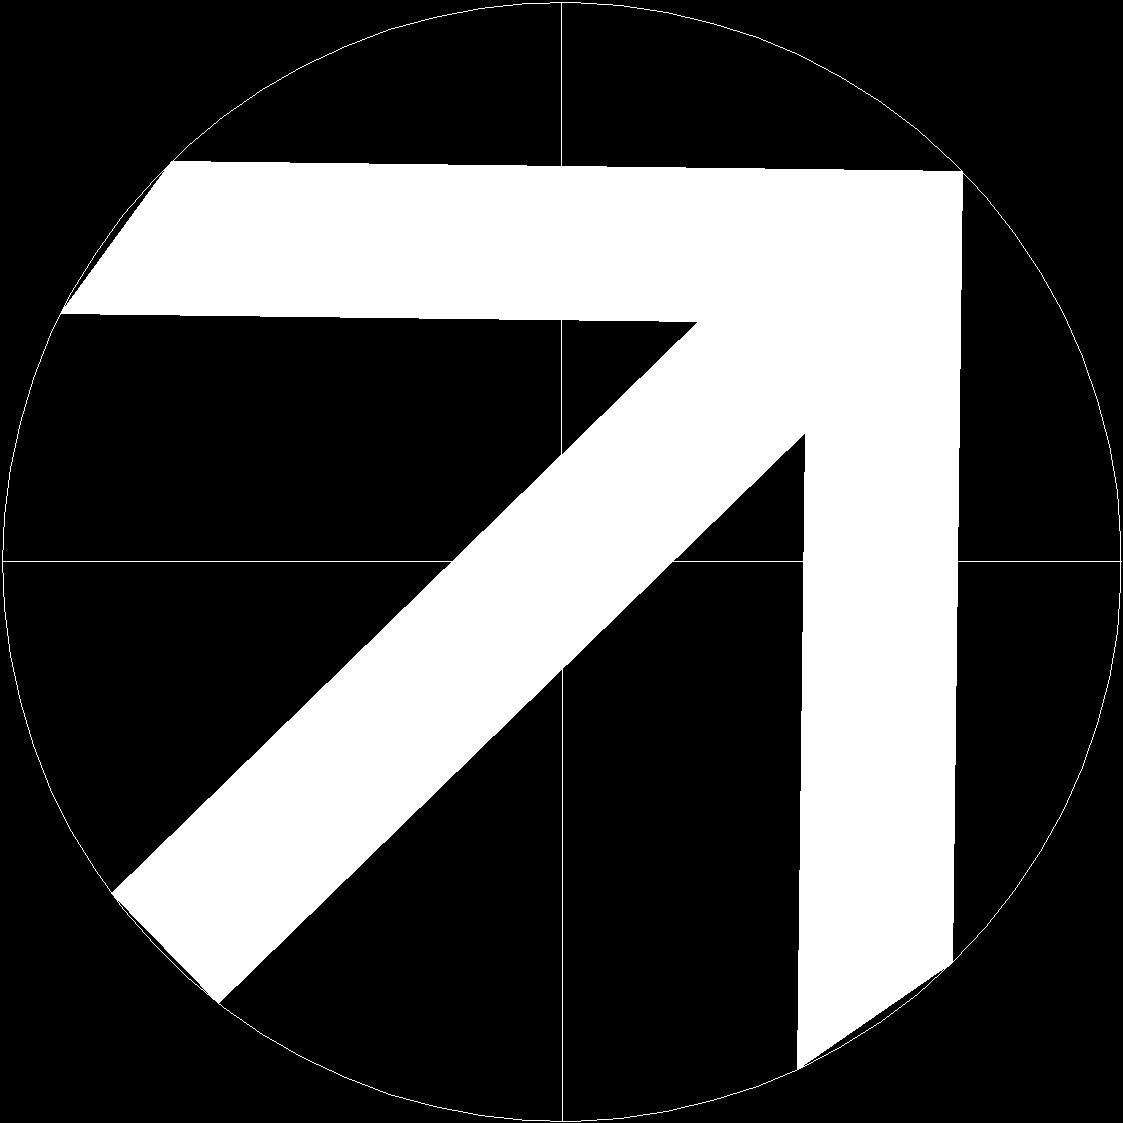 North arrow symbols dwg block for autocad designs cad additional screenshots biocorpaavc